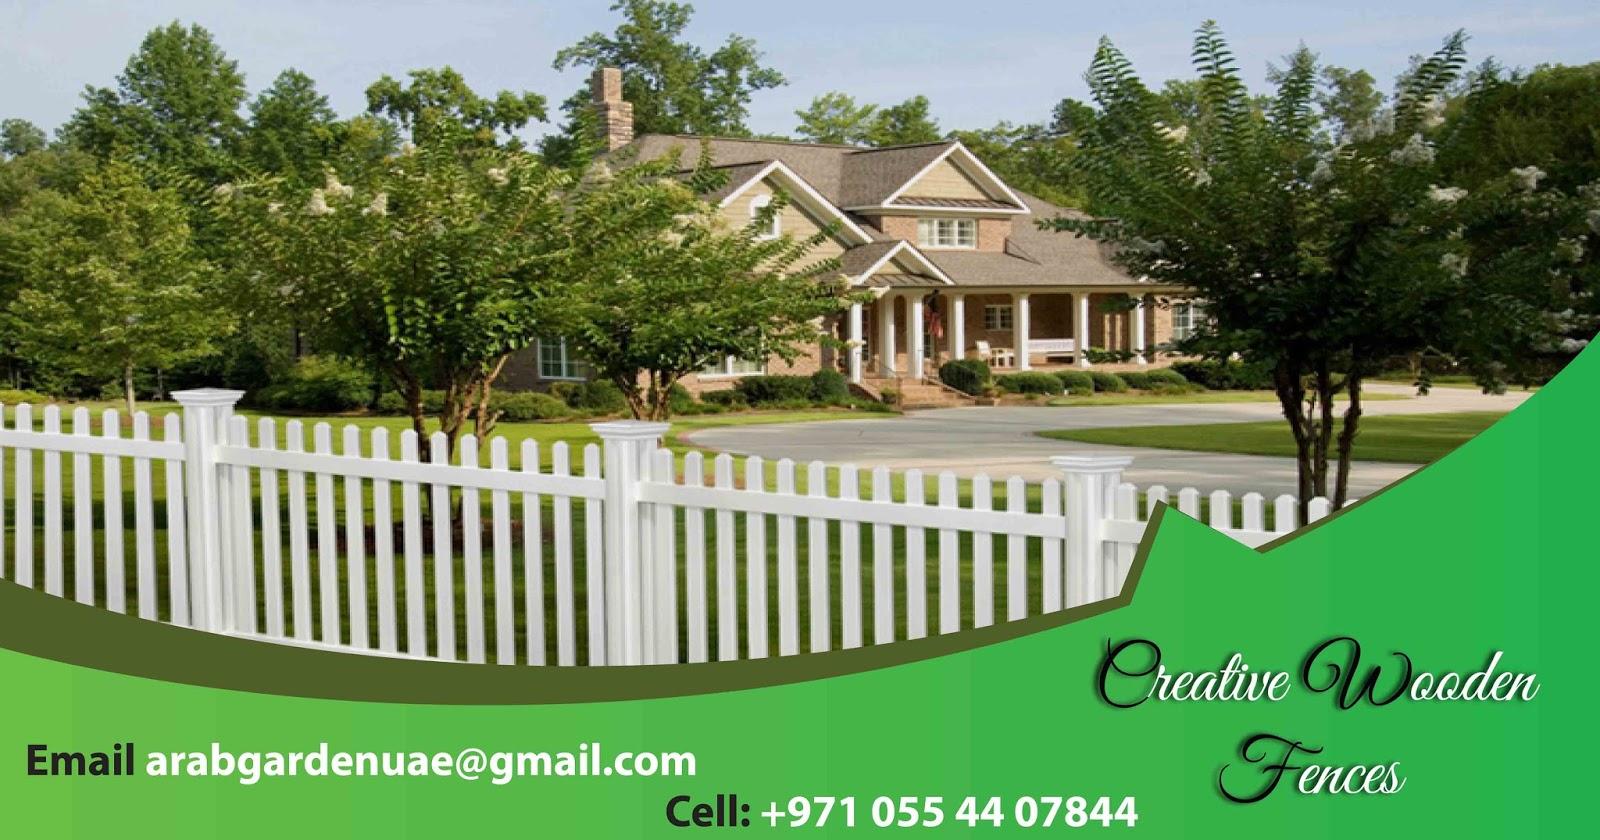 Design And Manufacturer Wooden Fence Pool Wood Fence Kids